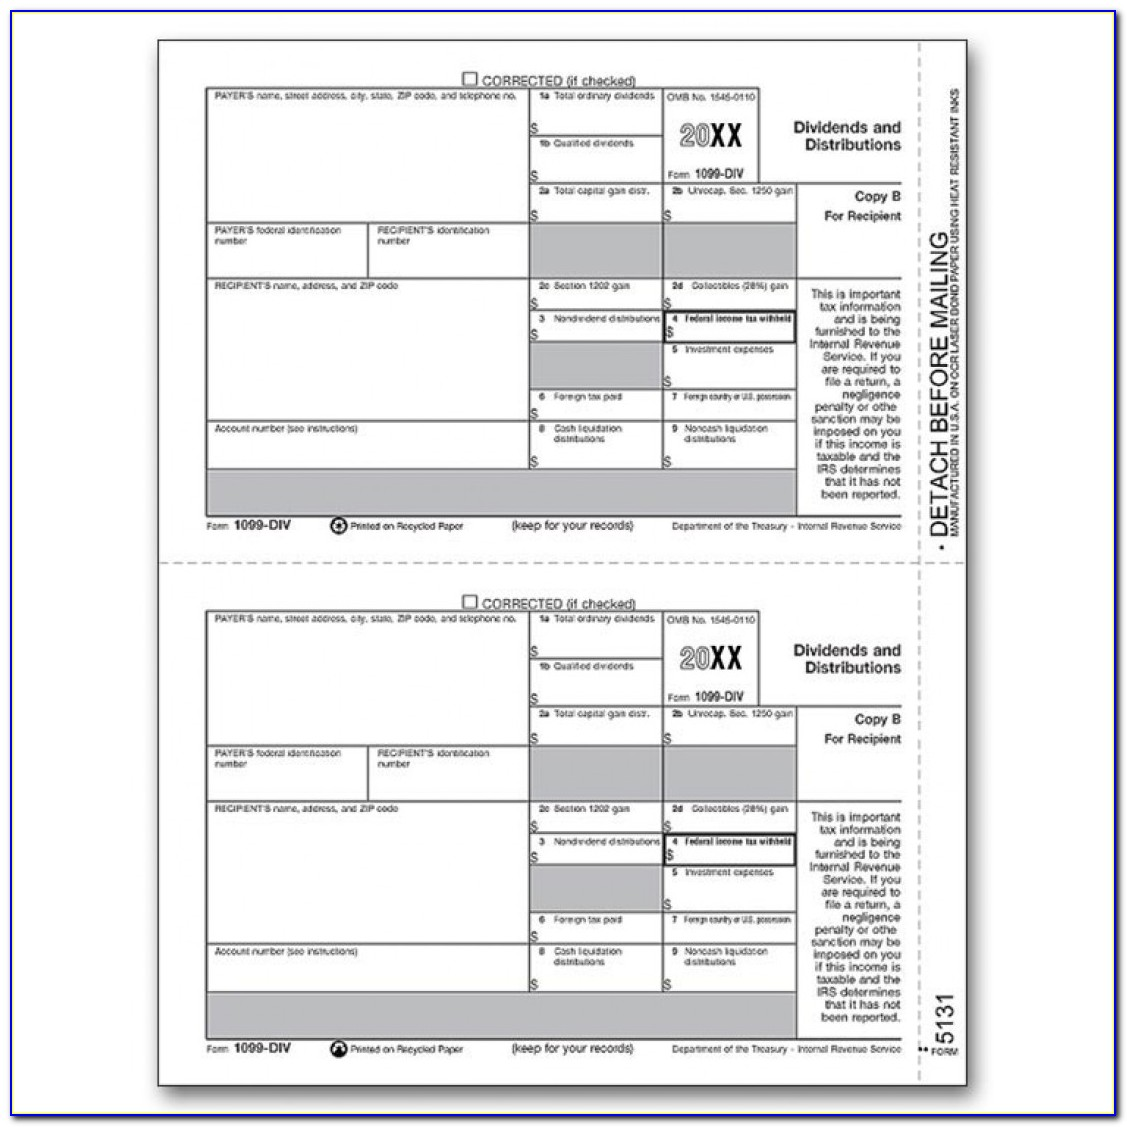 Printable 1099 Form 2017 Copy A